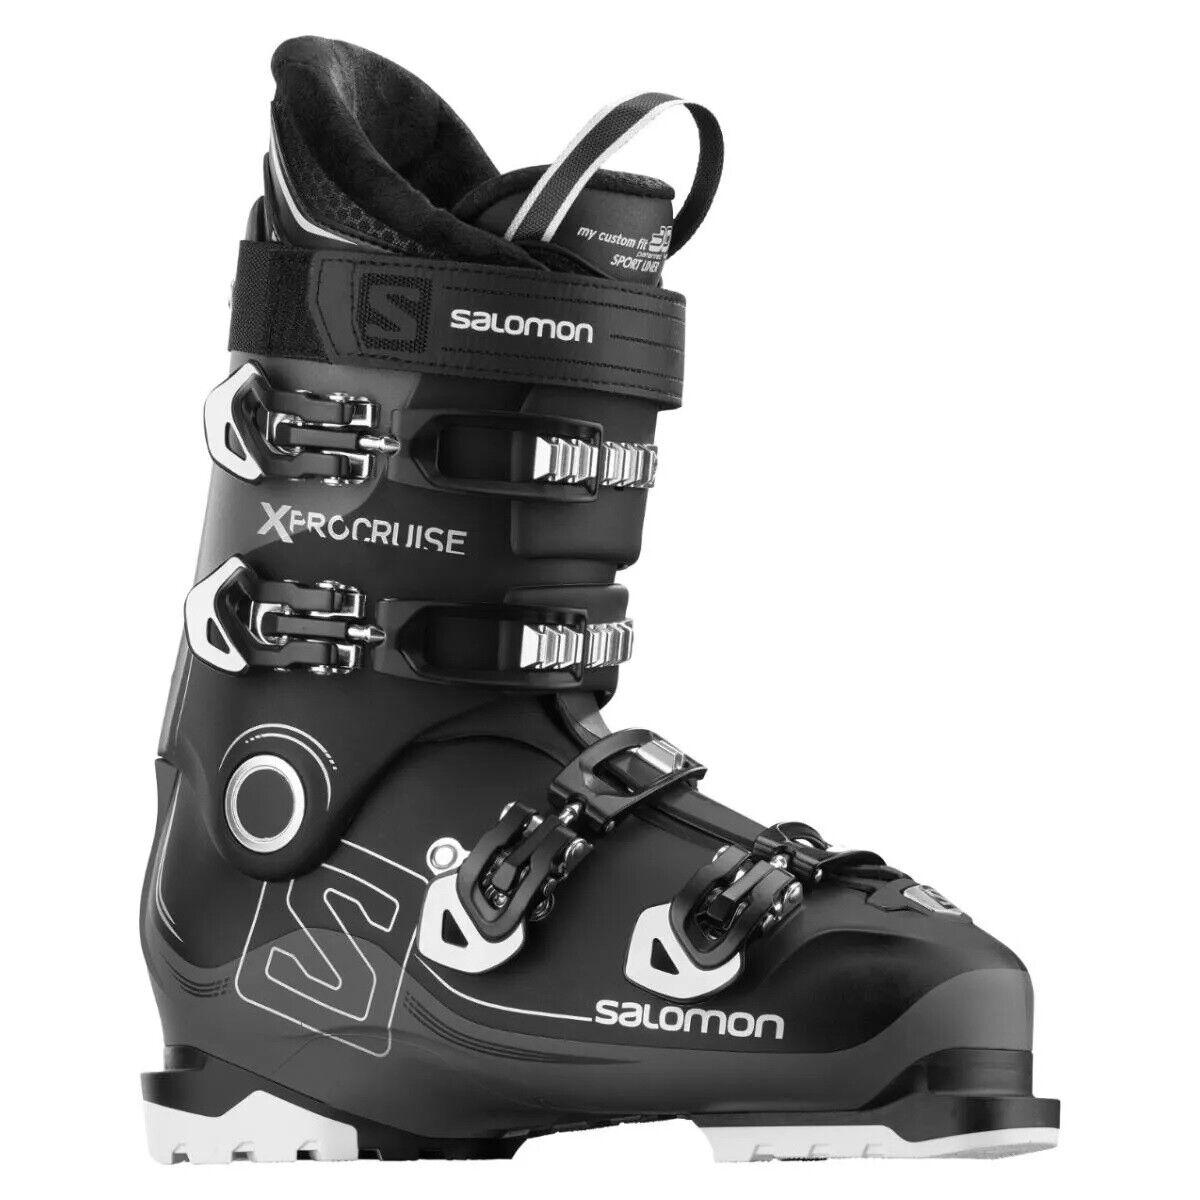 Salomon X Pro Cruise Ski Boots - 2020 - Men's  - 27.5 MP   US 9.5 US  zero profit